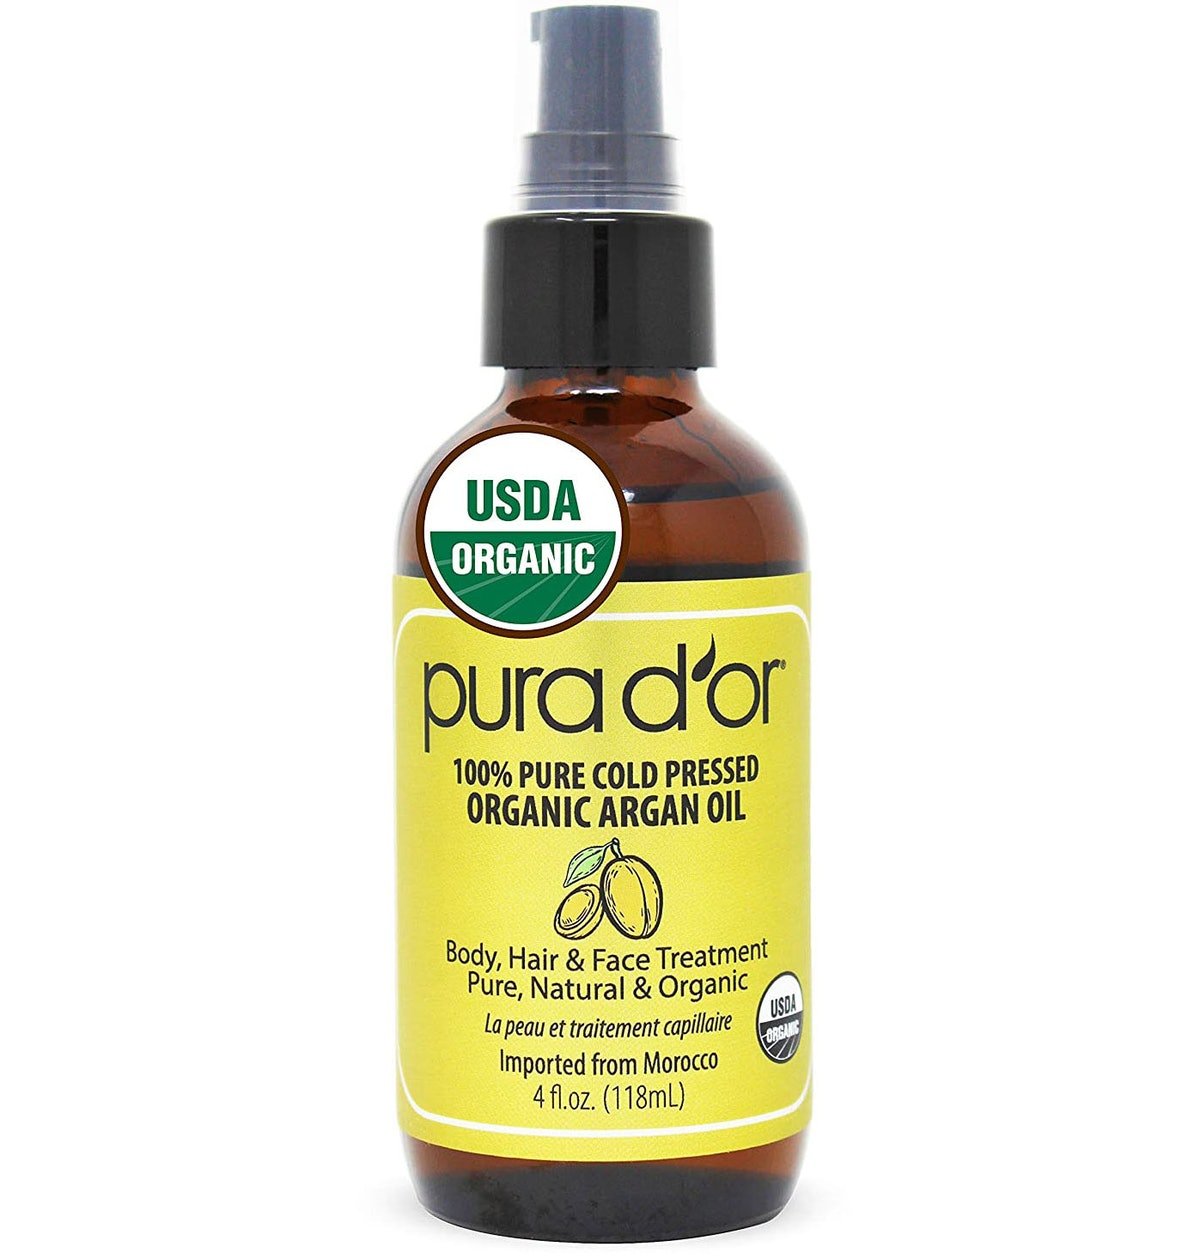 PURA D'OR 100% Pure Cold Pressed Organic Argan Oil